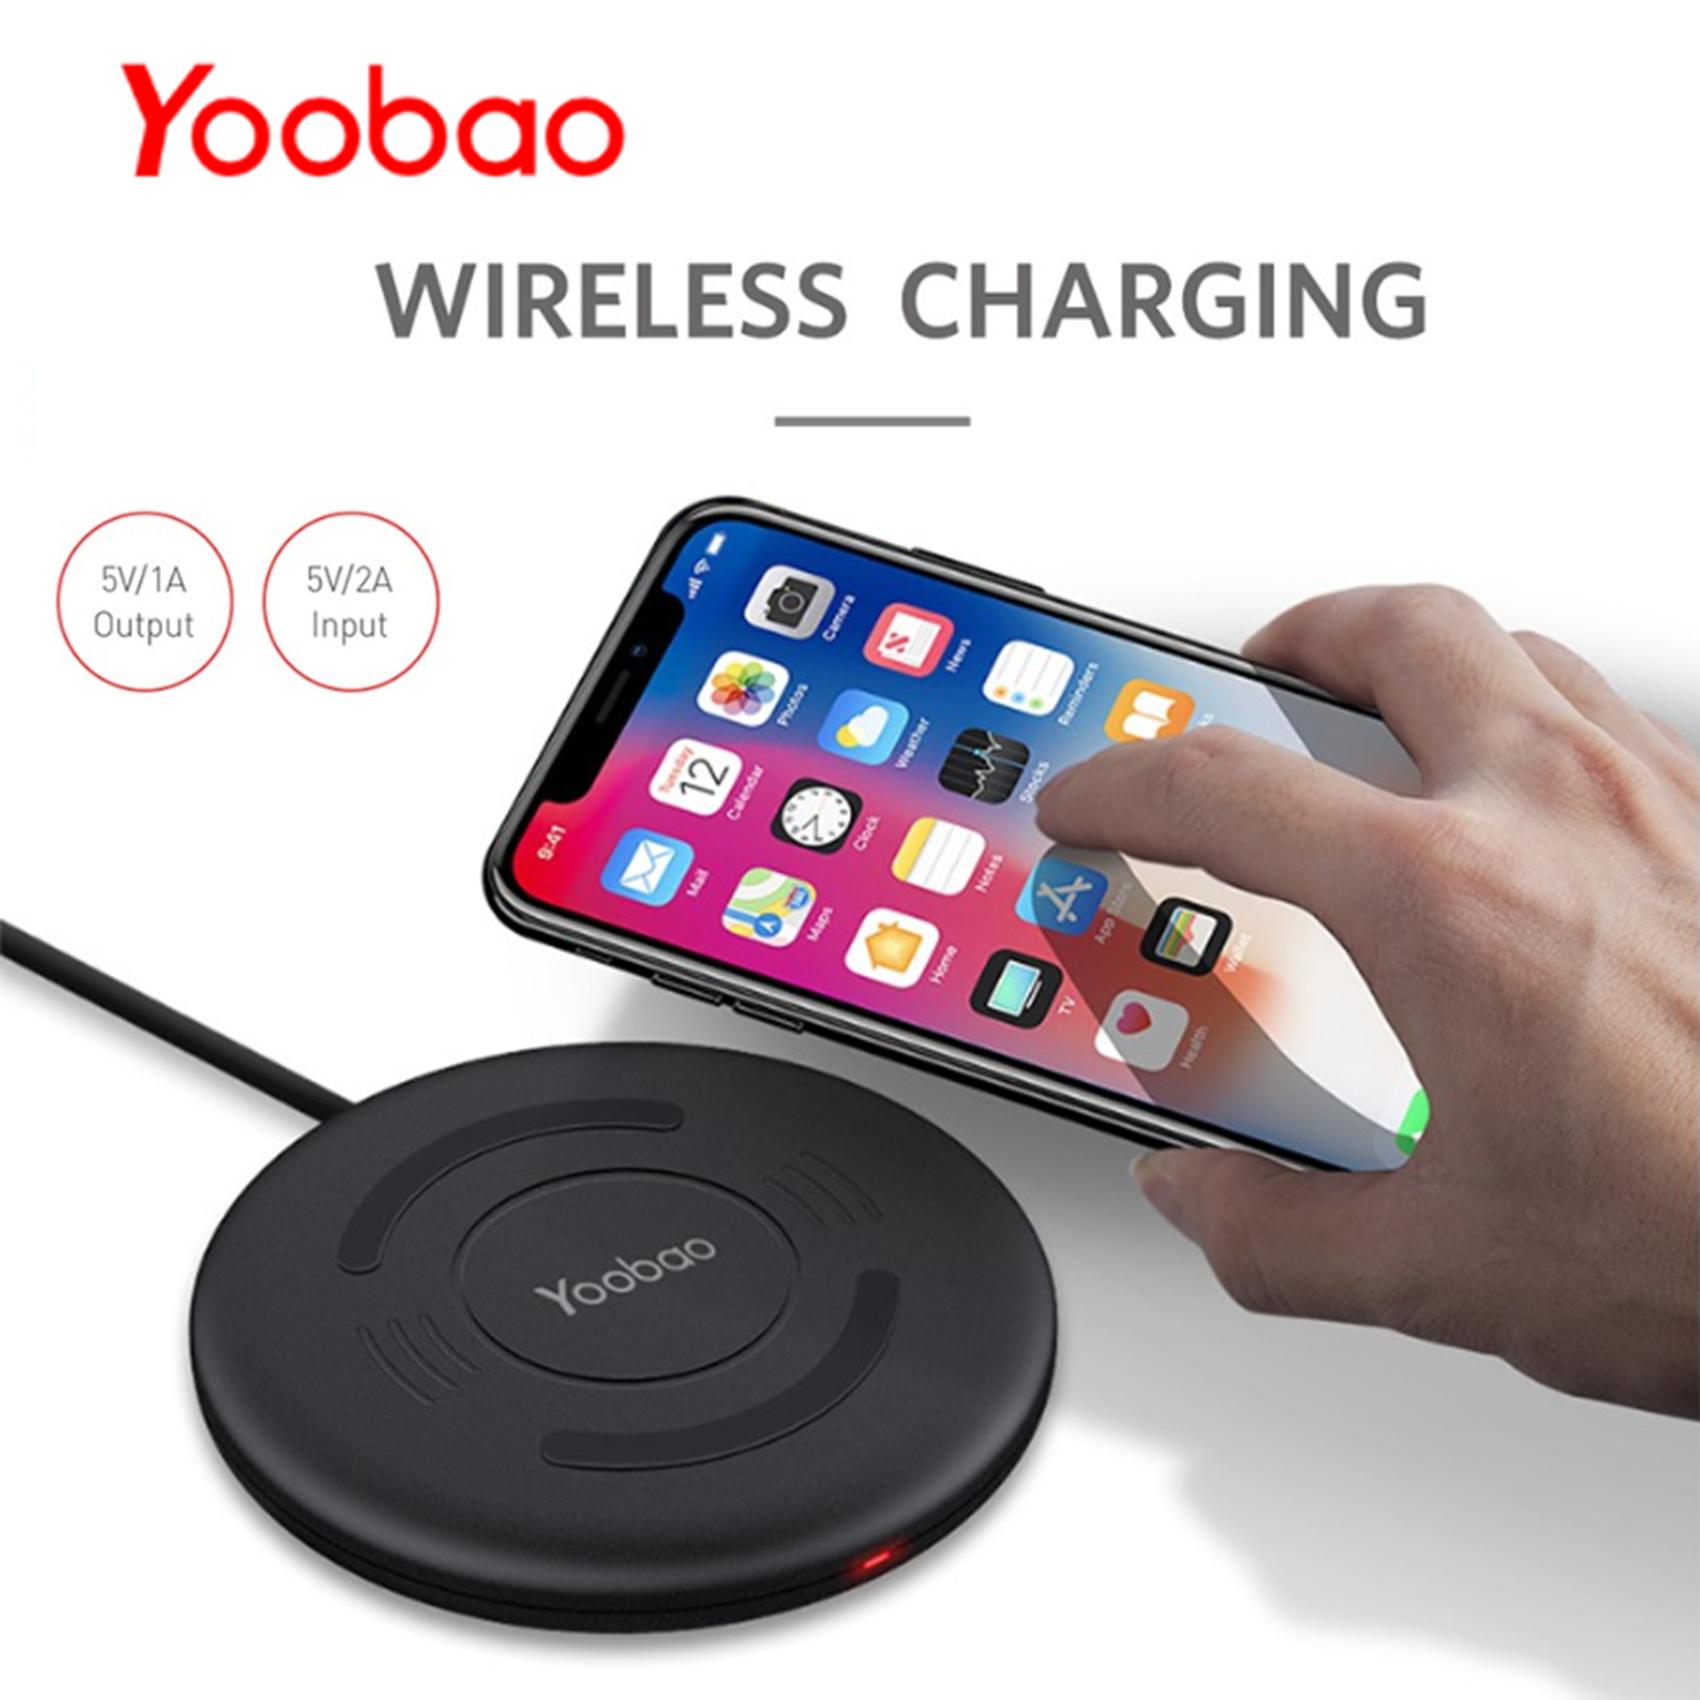 Yoobao D1 Wireless Charging Pad - Black